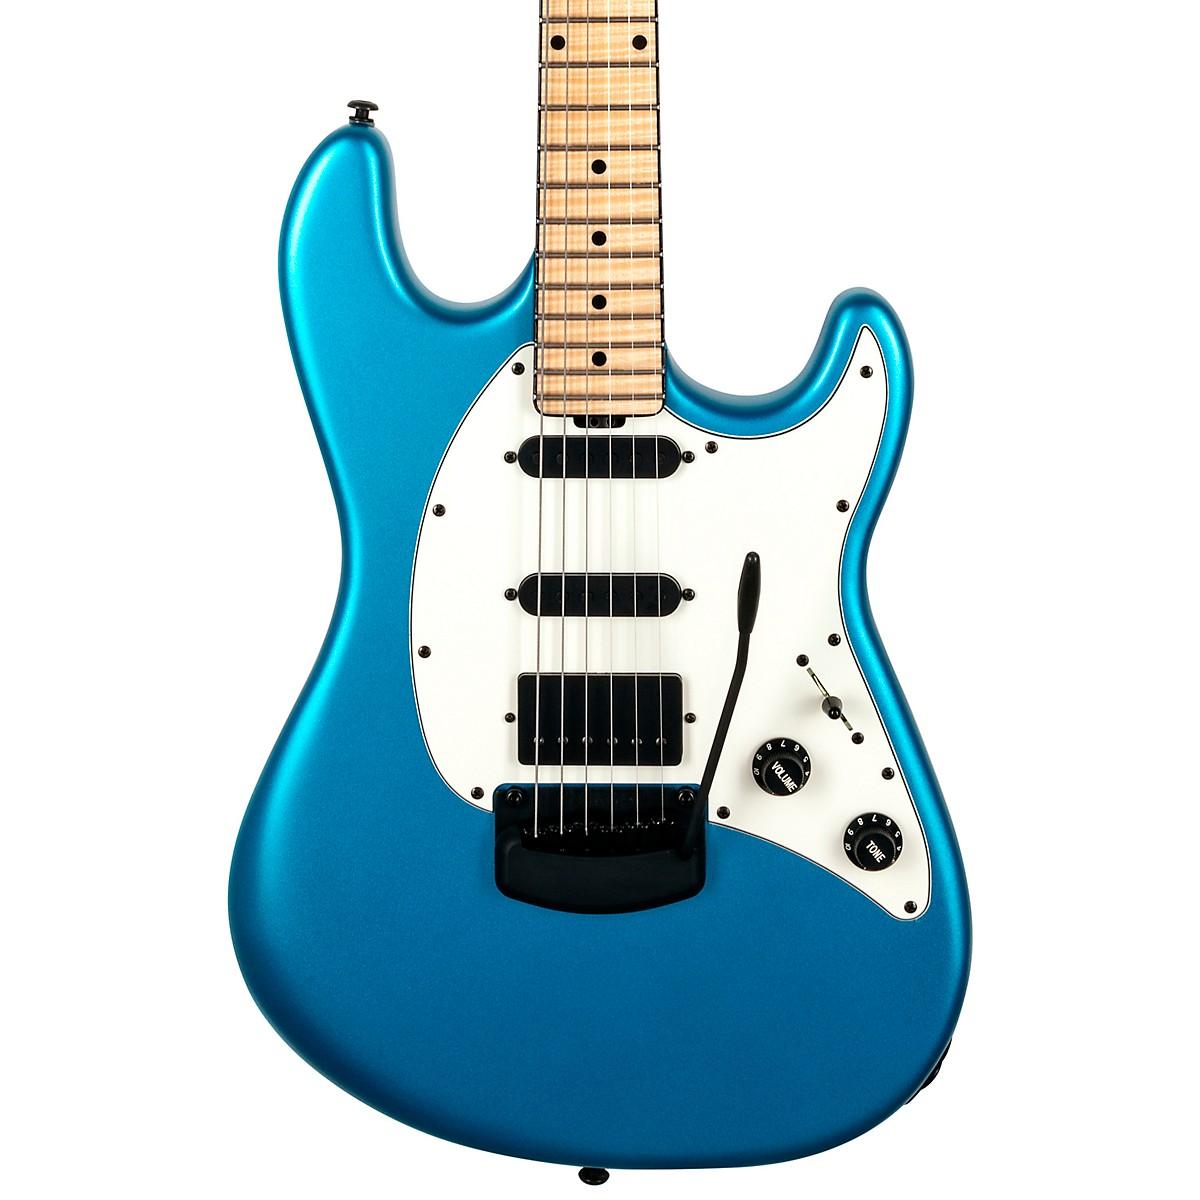 Ernie Ball Music Man Cutlass HSS BFR Electric Guitar